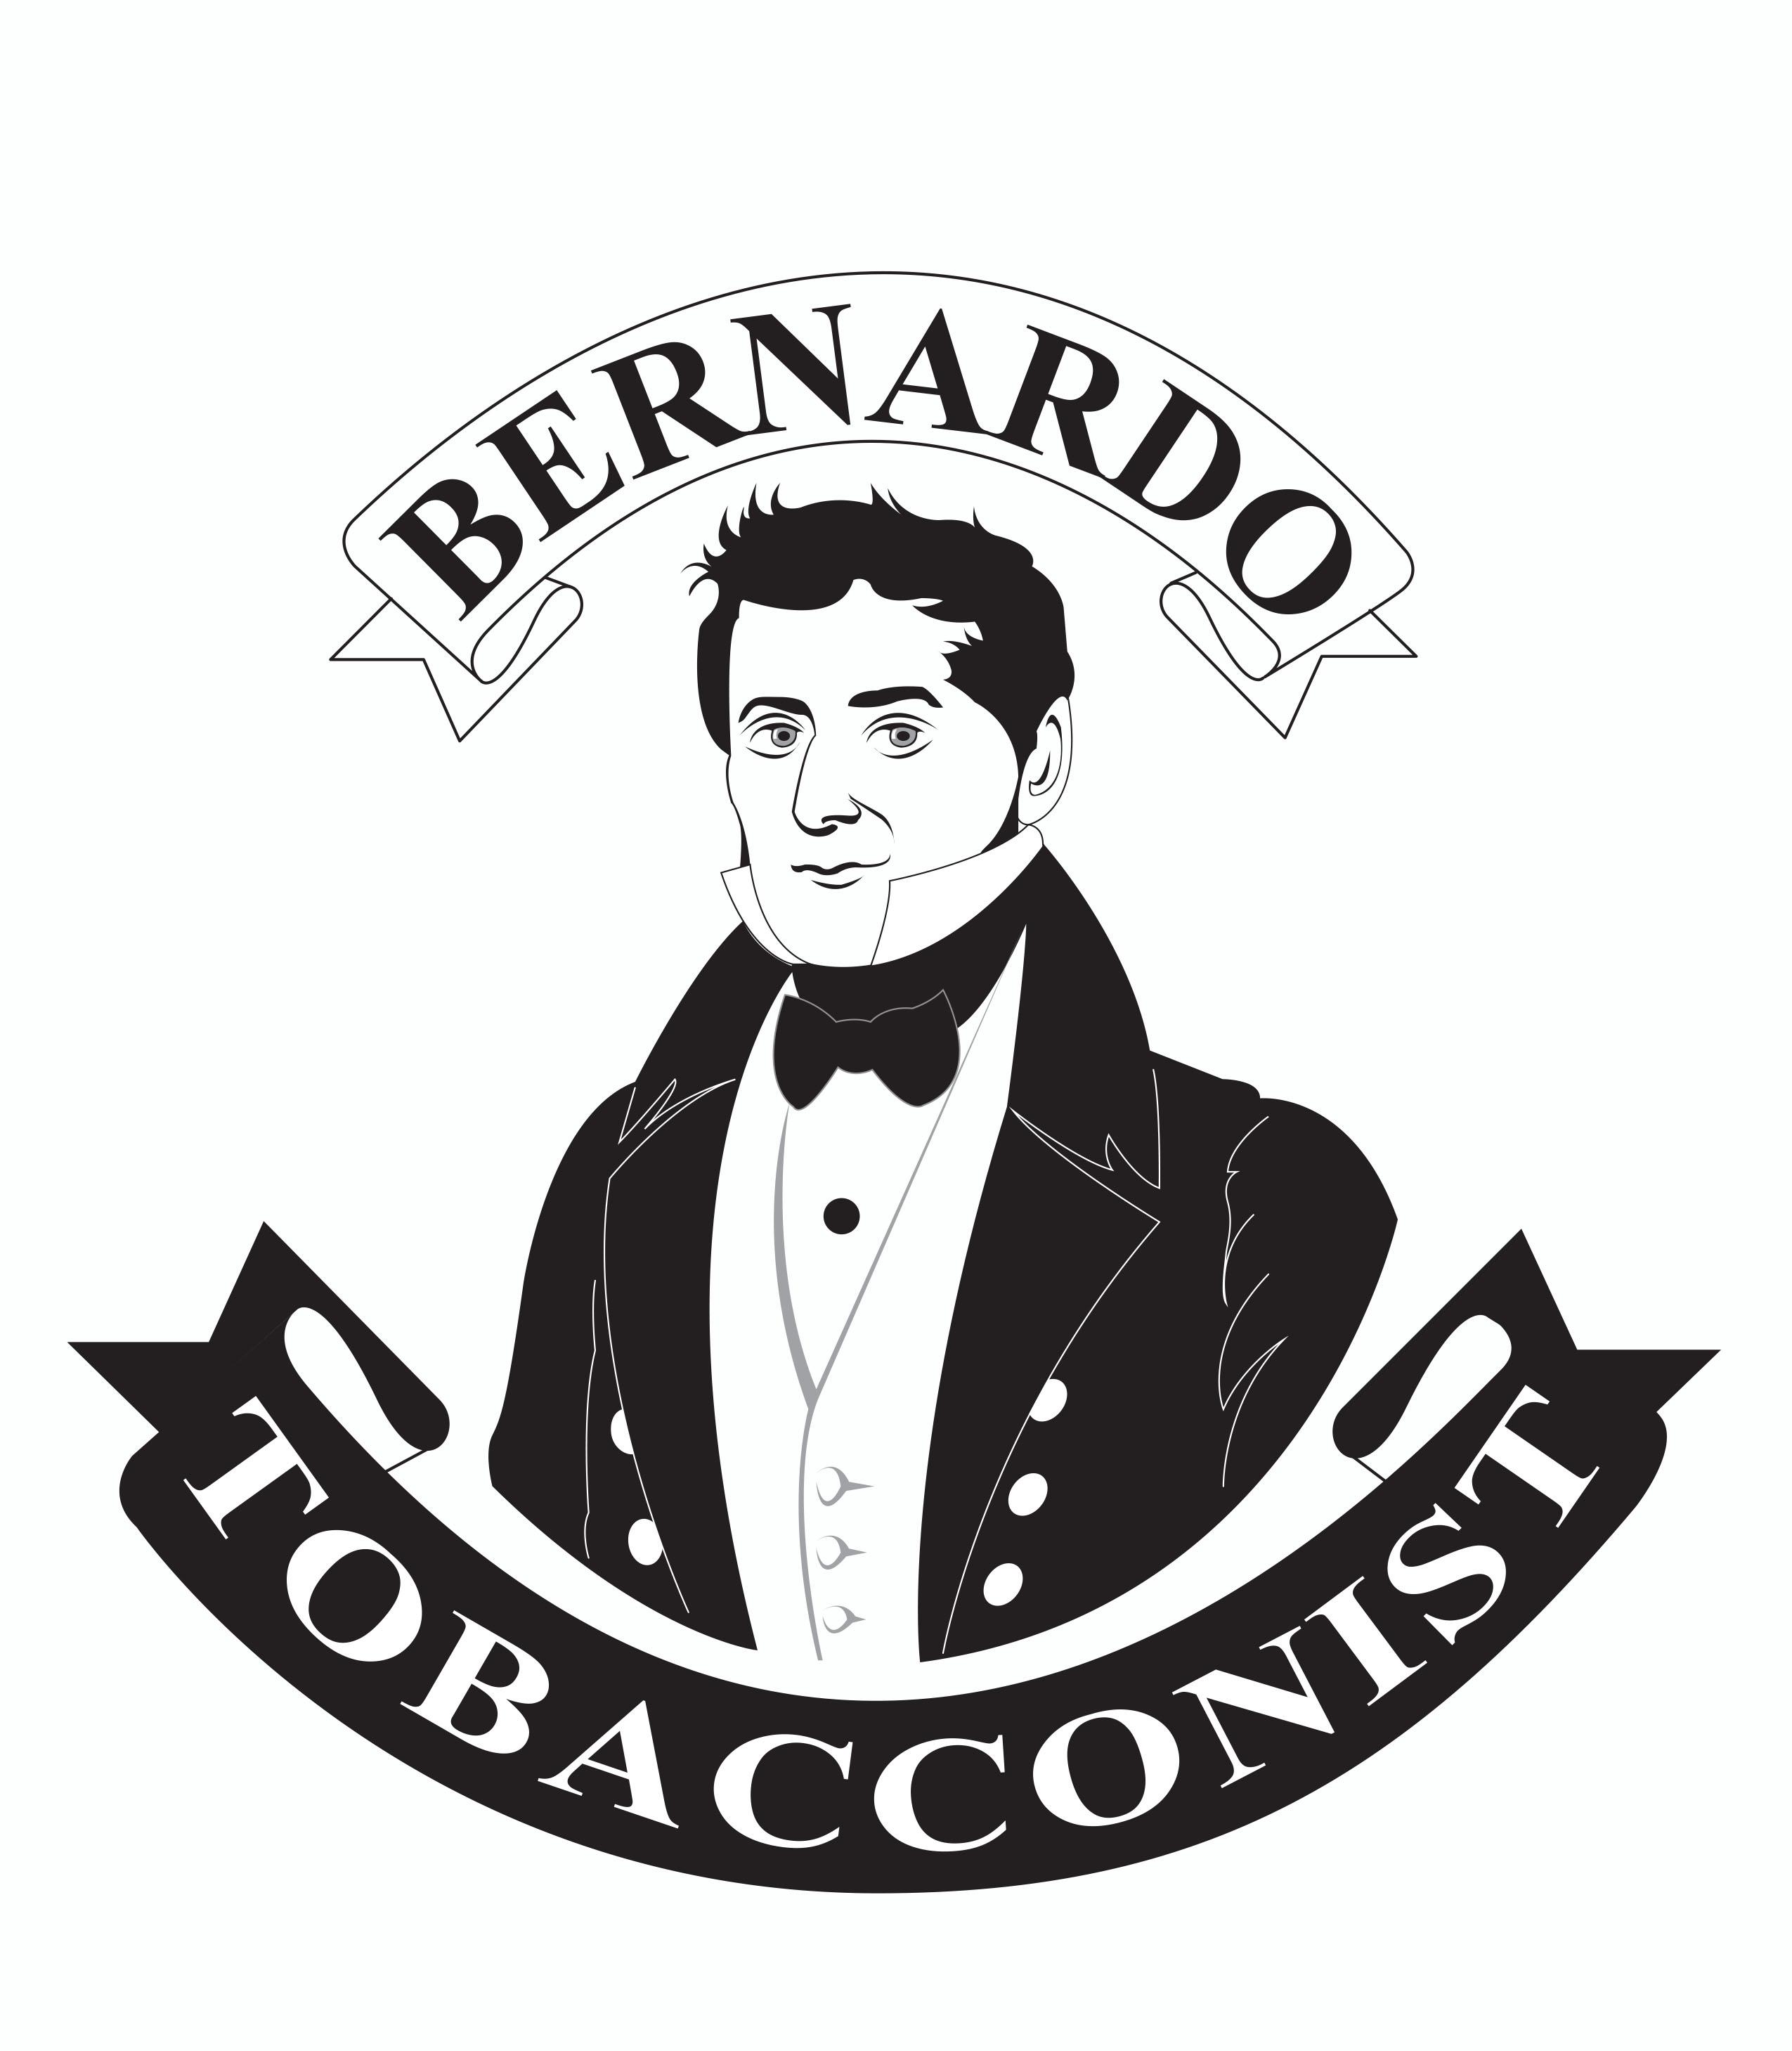 BERNARDO TOBACCONIST LOGO